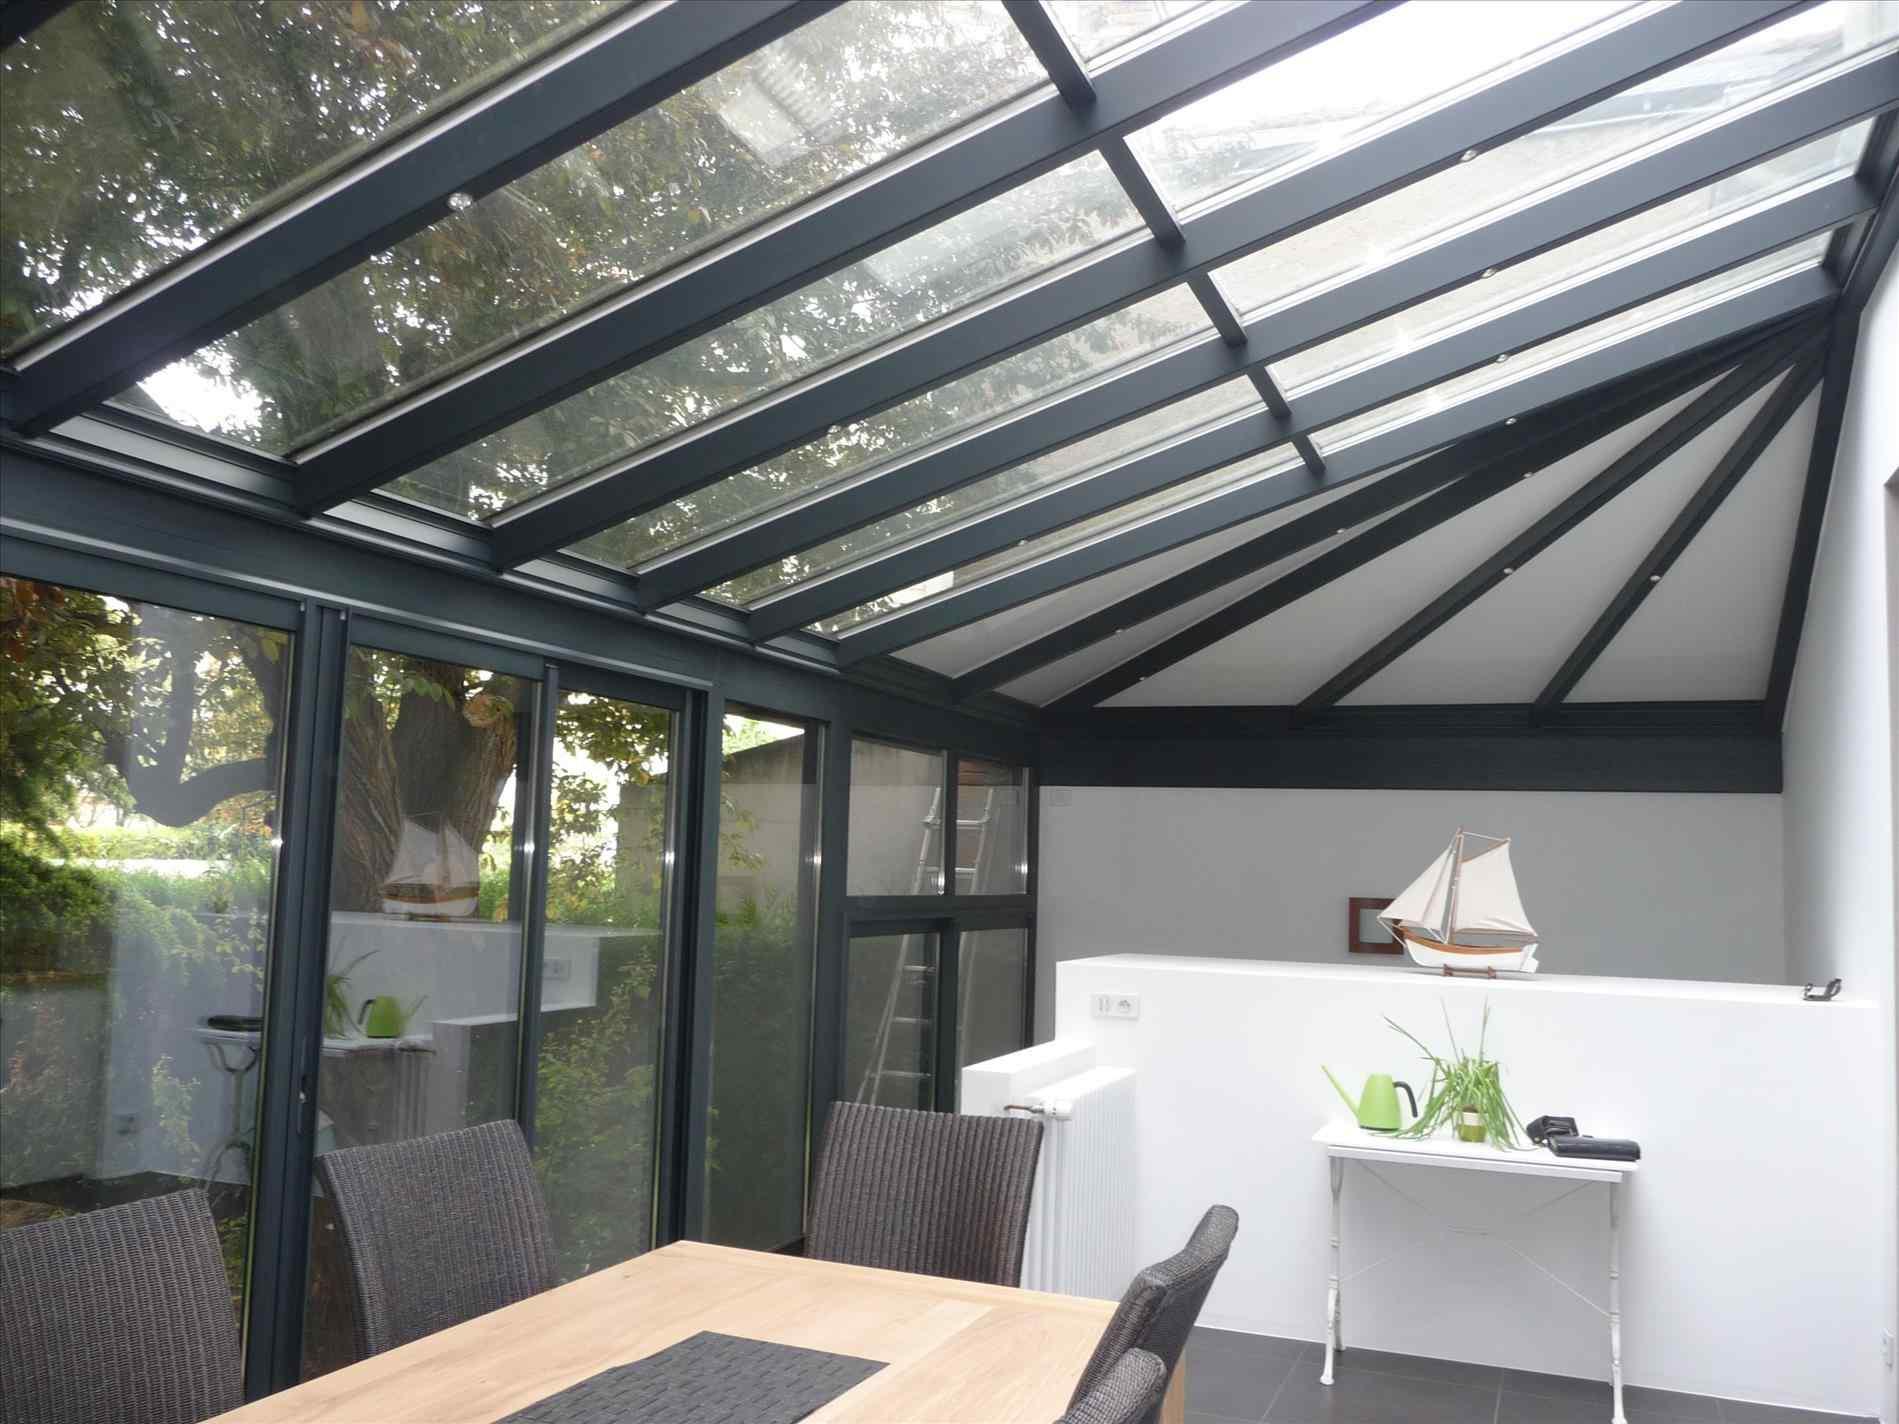 tarif v randa habitable veranda. Black Bedroom Furniture Sets. Home Design Ideas